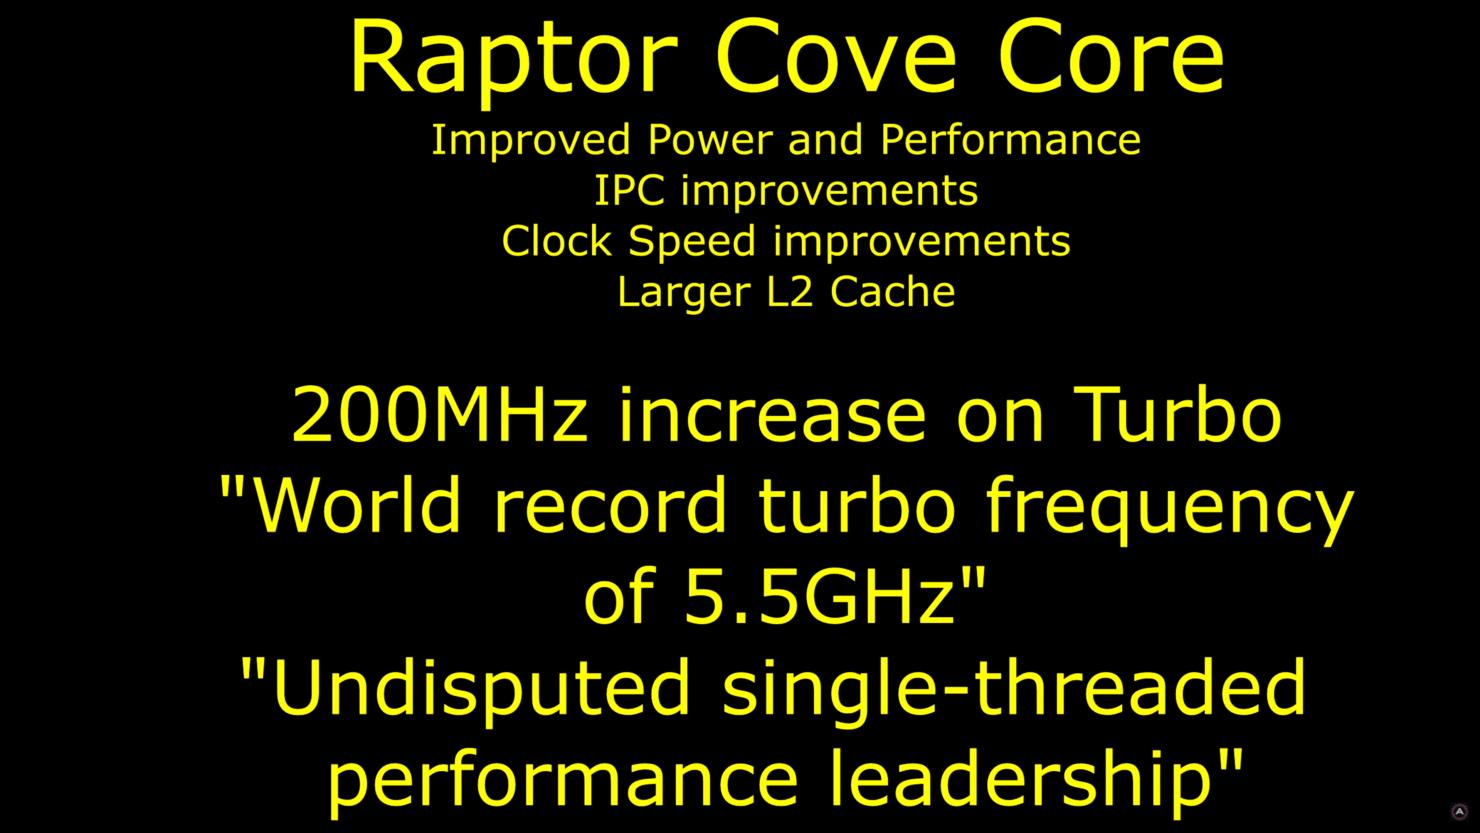 intel-raptor-lake-s-desktop-cpus-13th-gen-core-family-with-raptor-cove-cores-_3